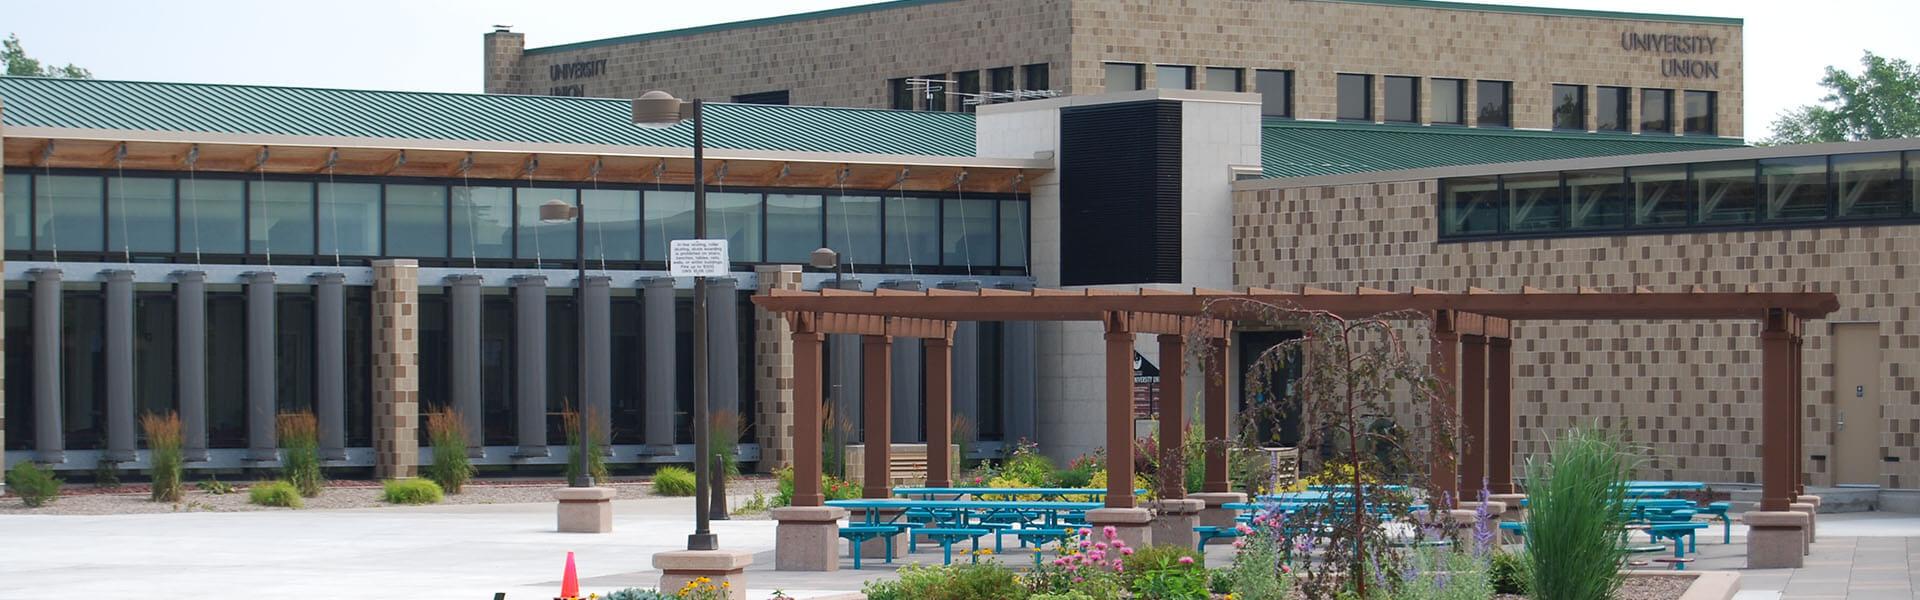 immel-banner_UWGB - Plaza Deck